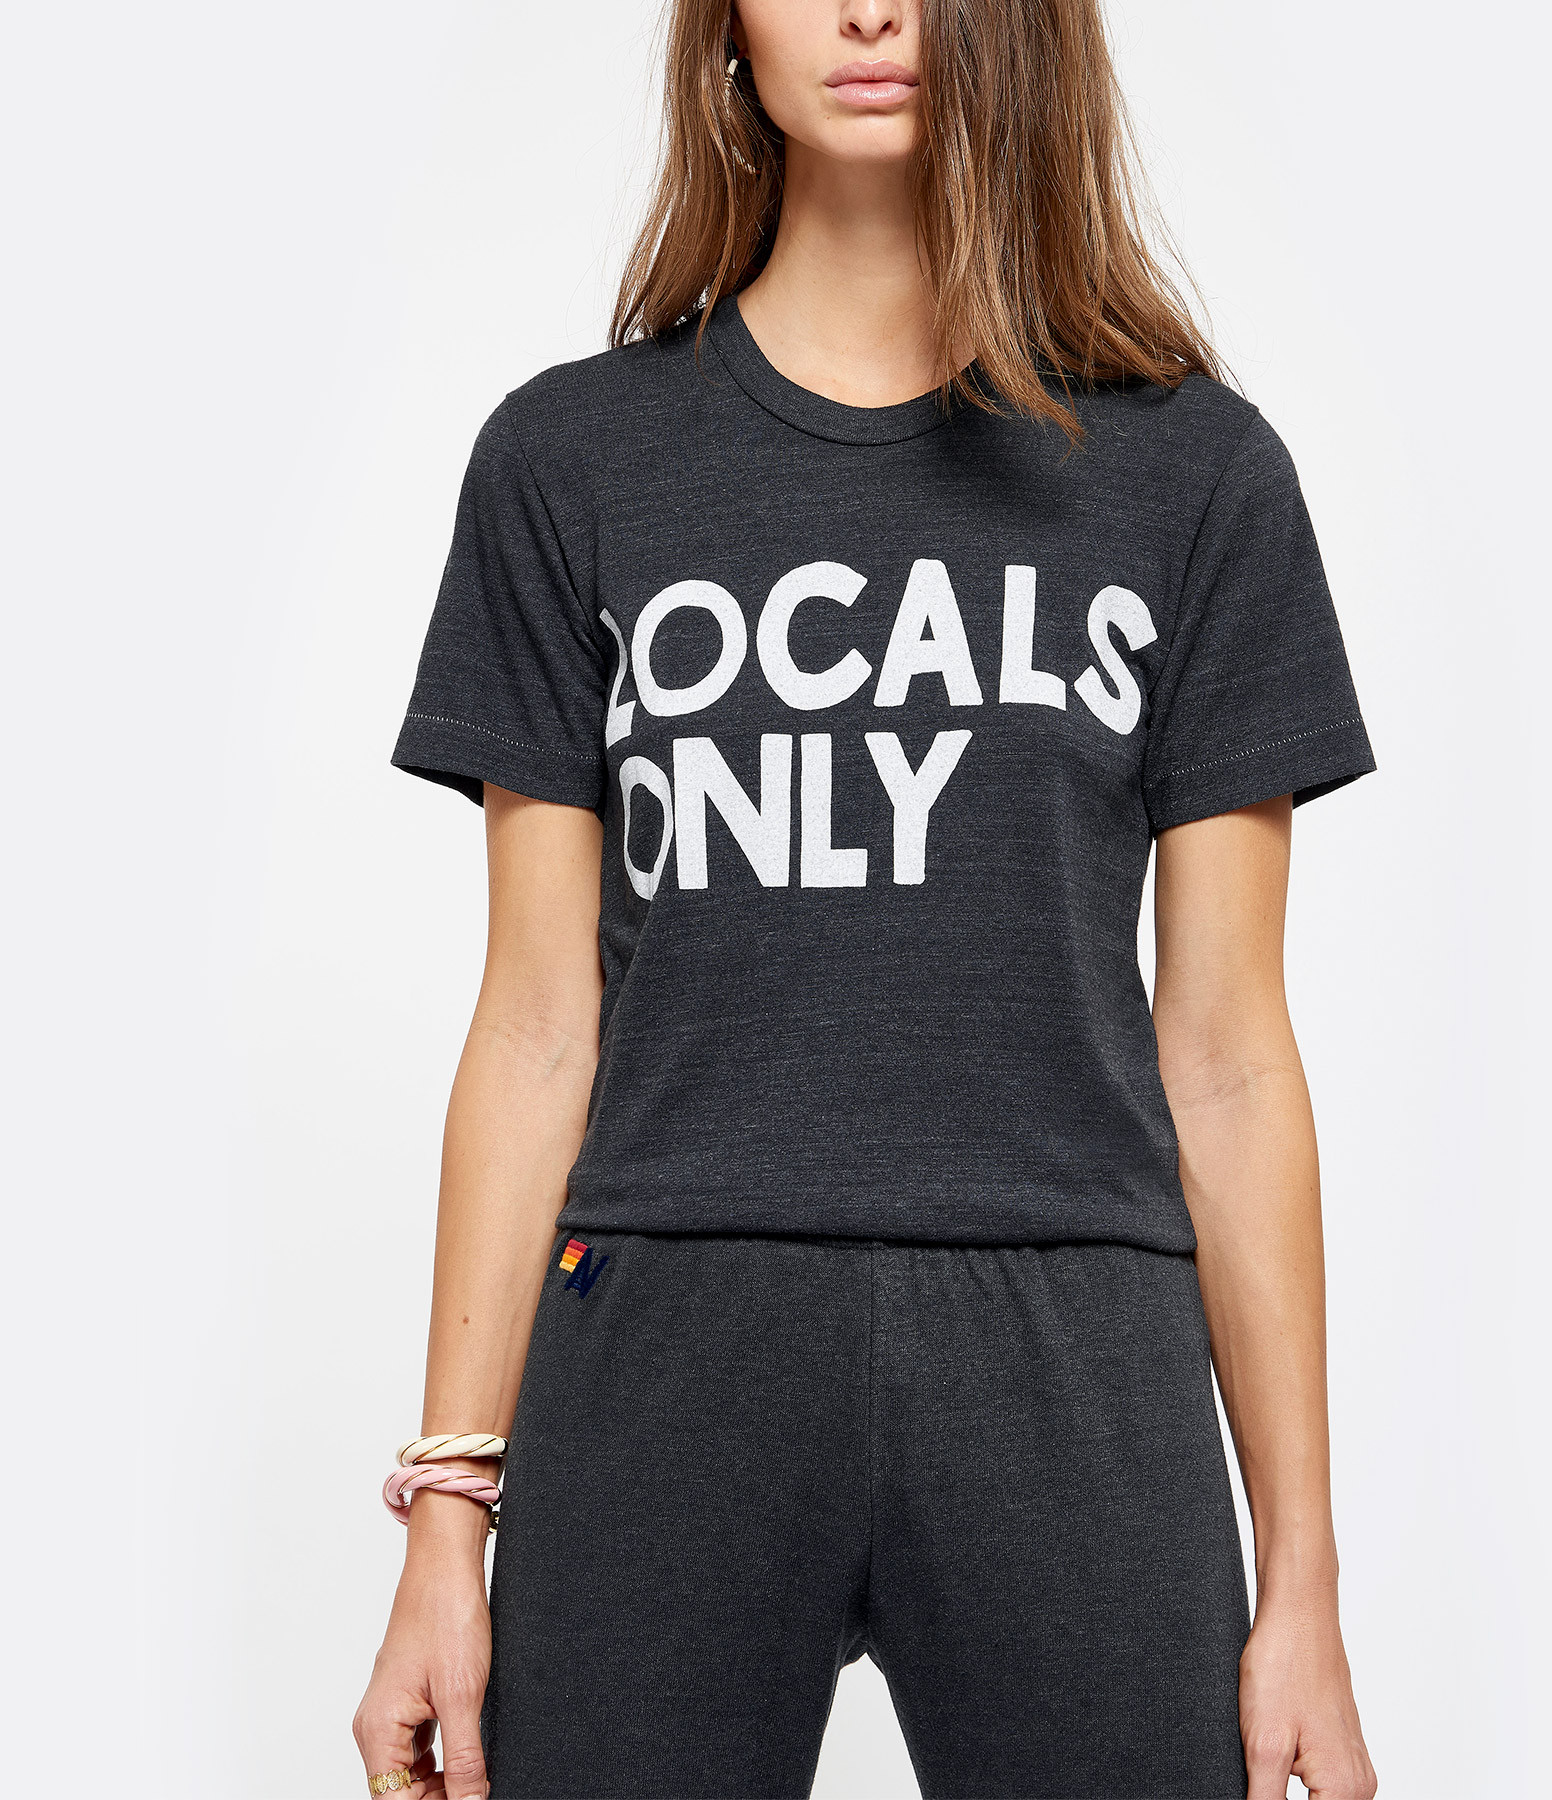 AVIATOR NATION - Tee-shirt Locals Coton Charbon